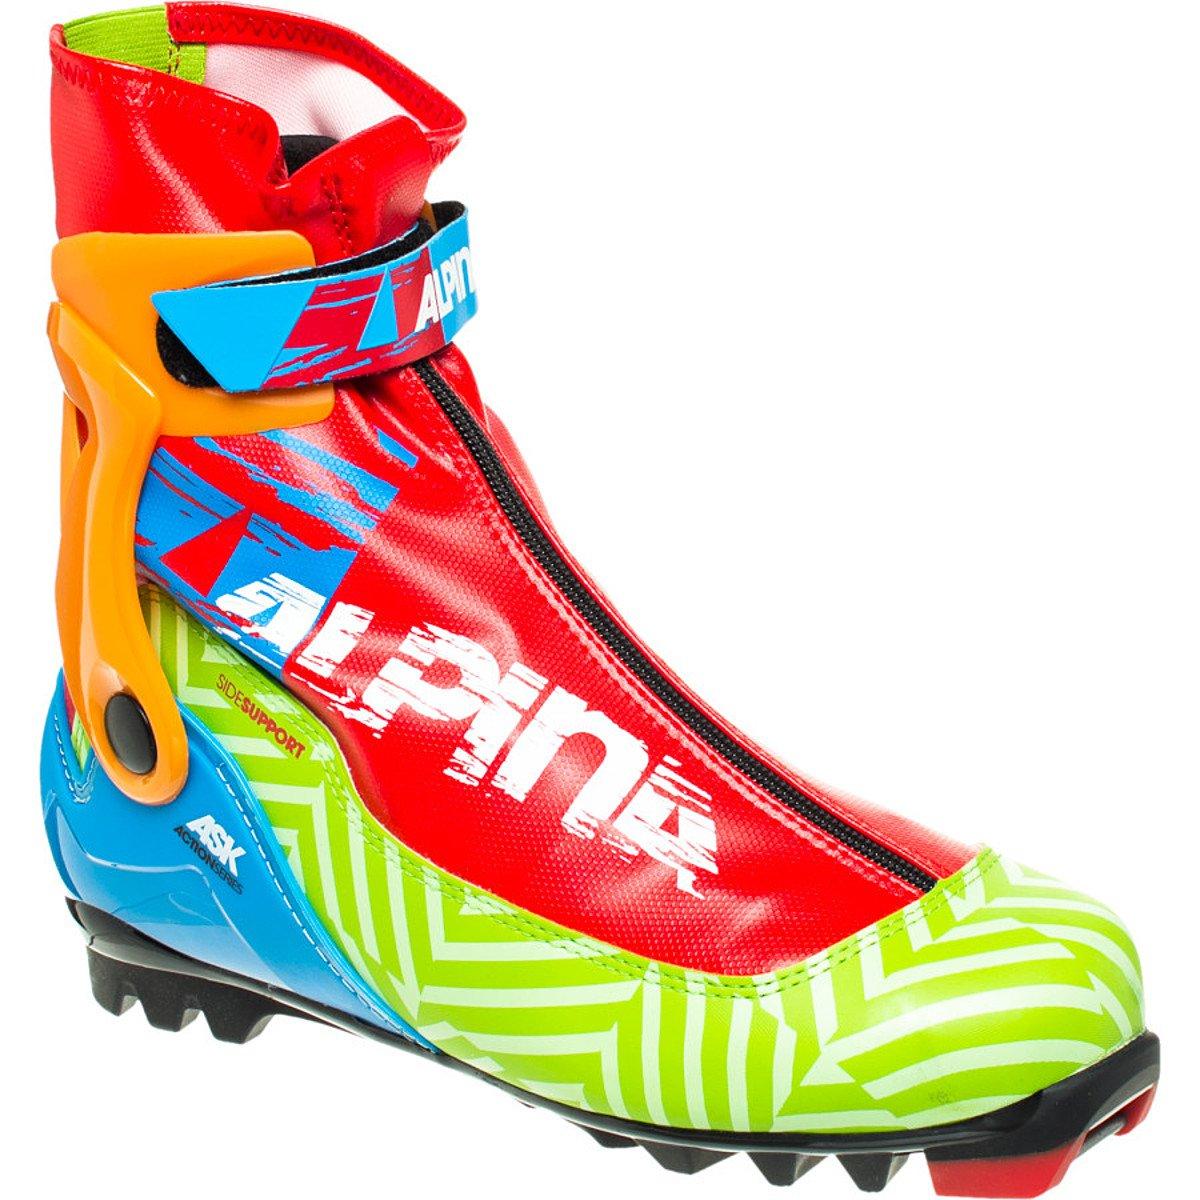 Amazon.com : Alpina ASK Action Series Cross-Country Nordic Skate Ski ...